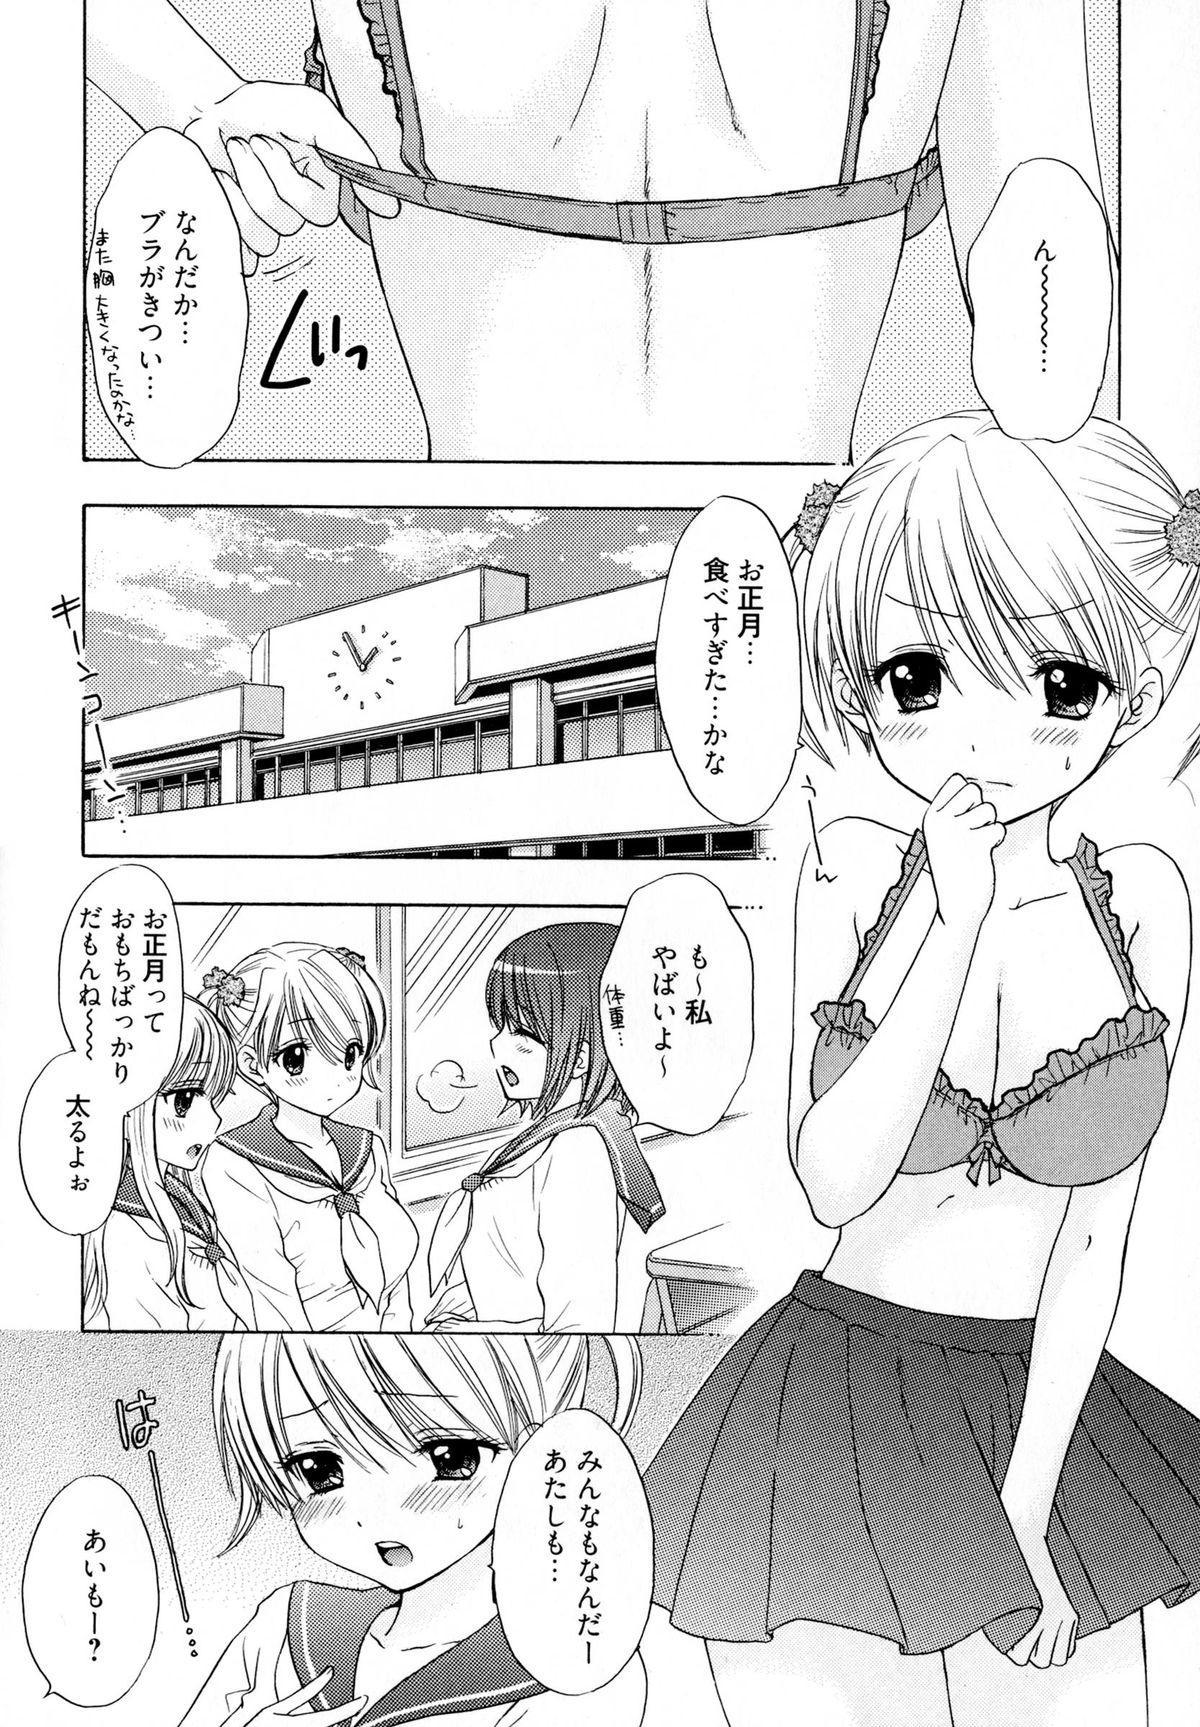 The Great Escape 4 Shokai Genteiban 37